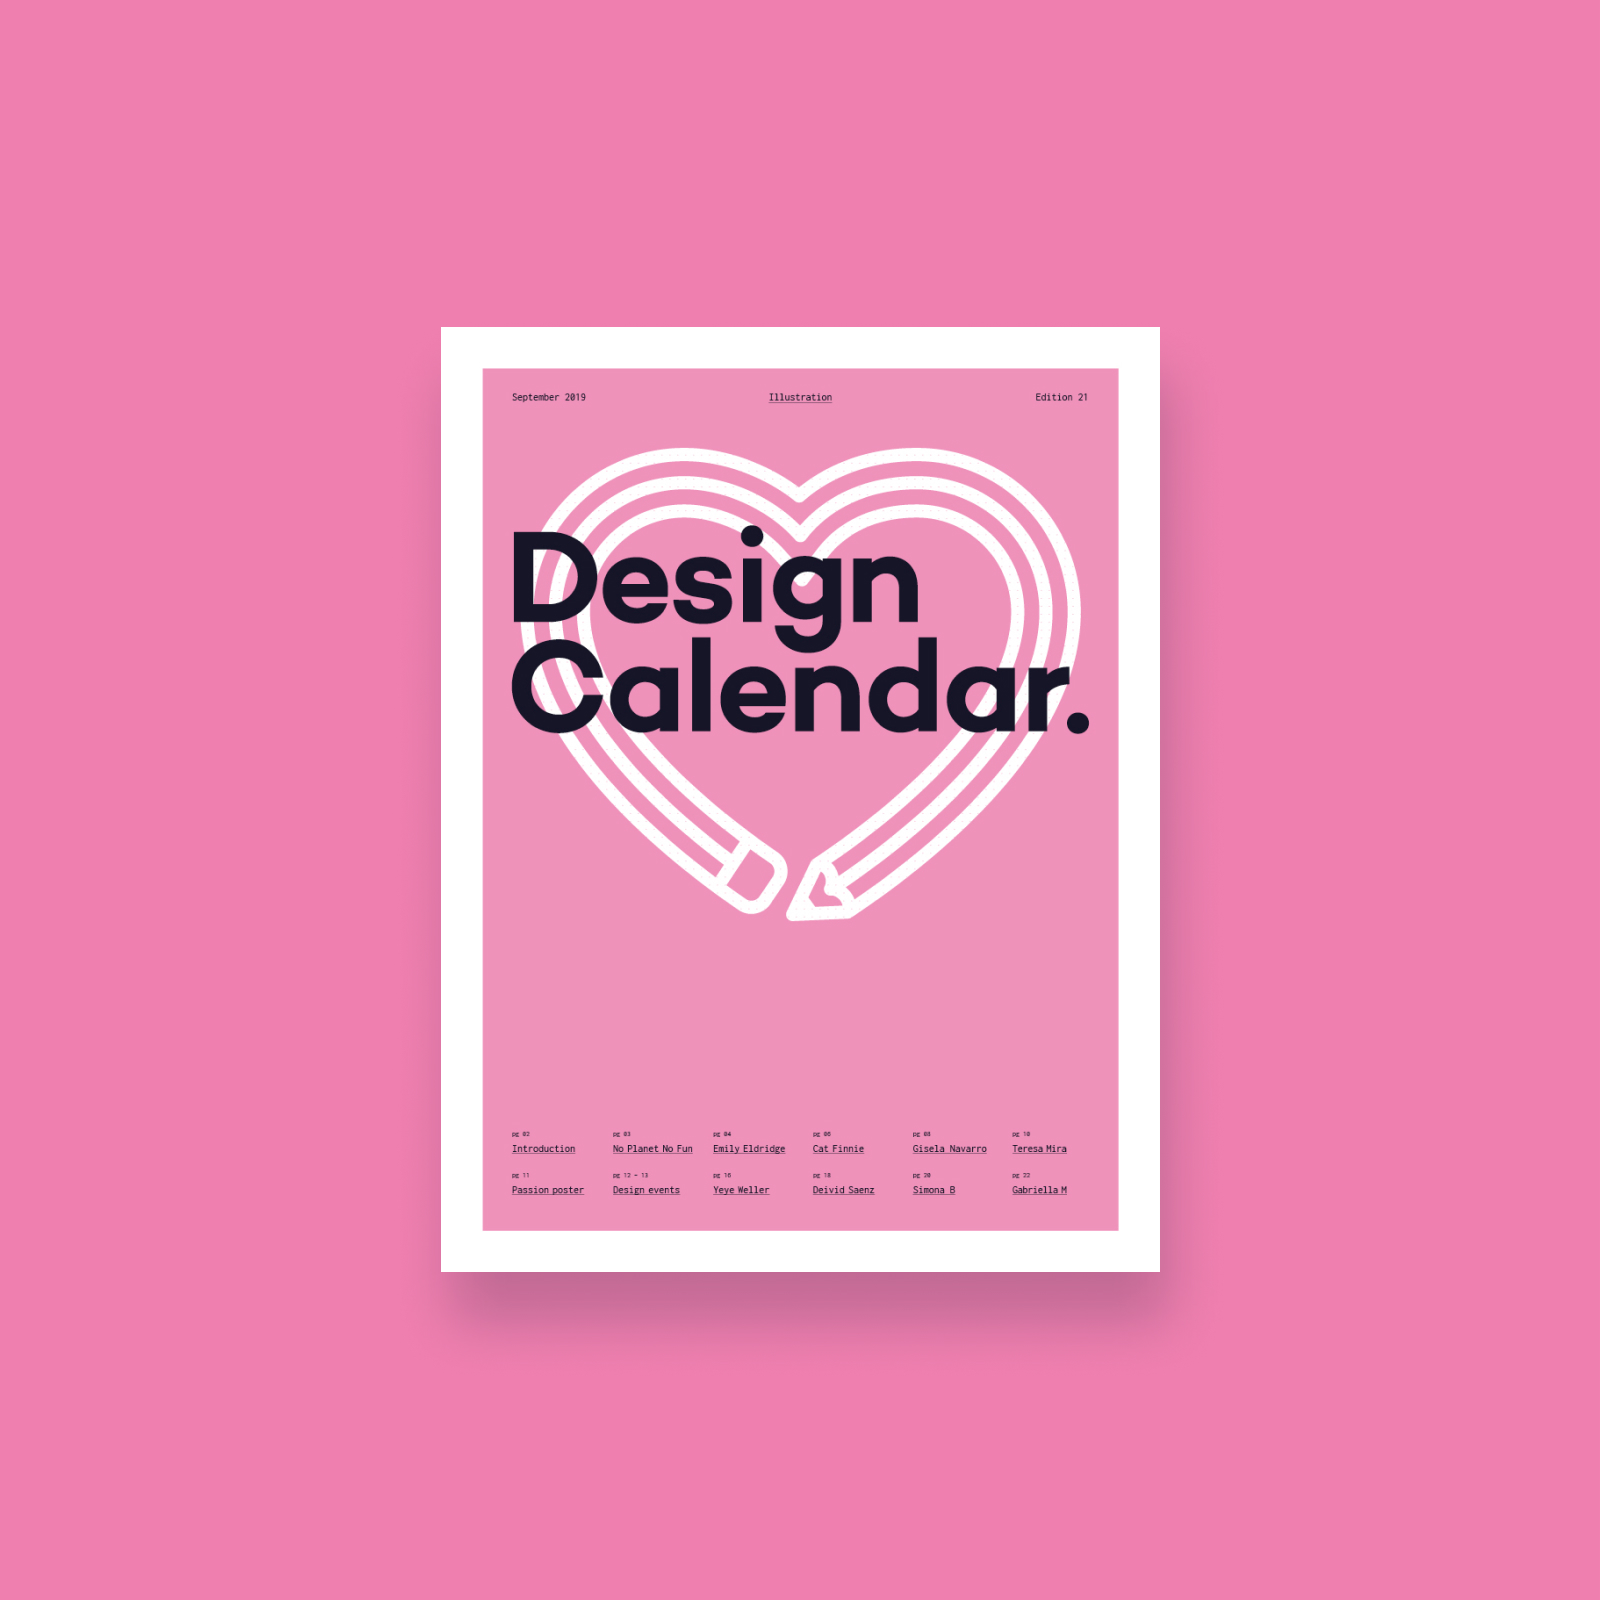 Design Calendar - September Edition